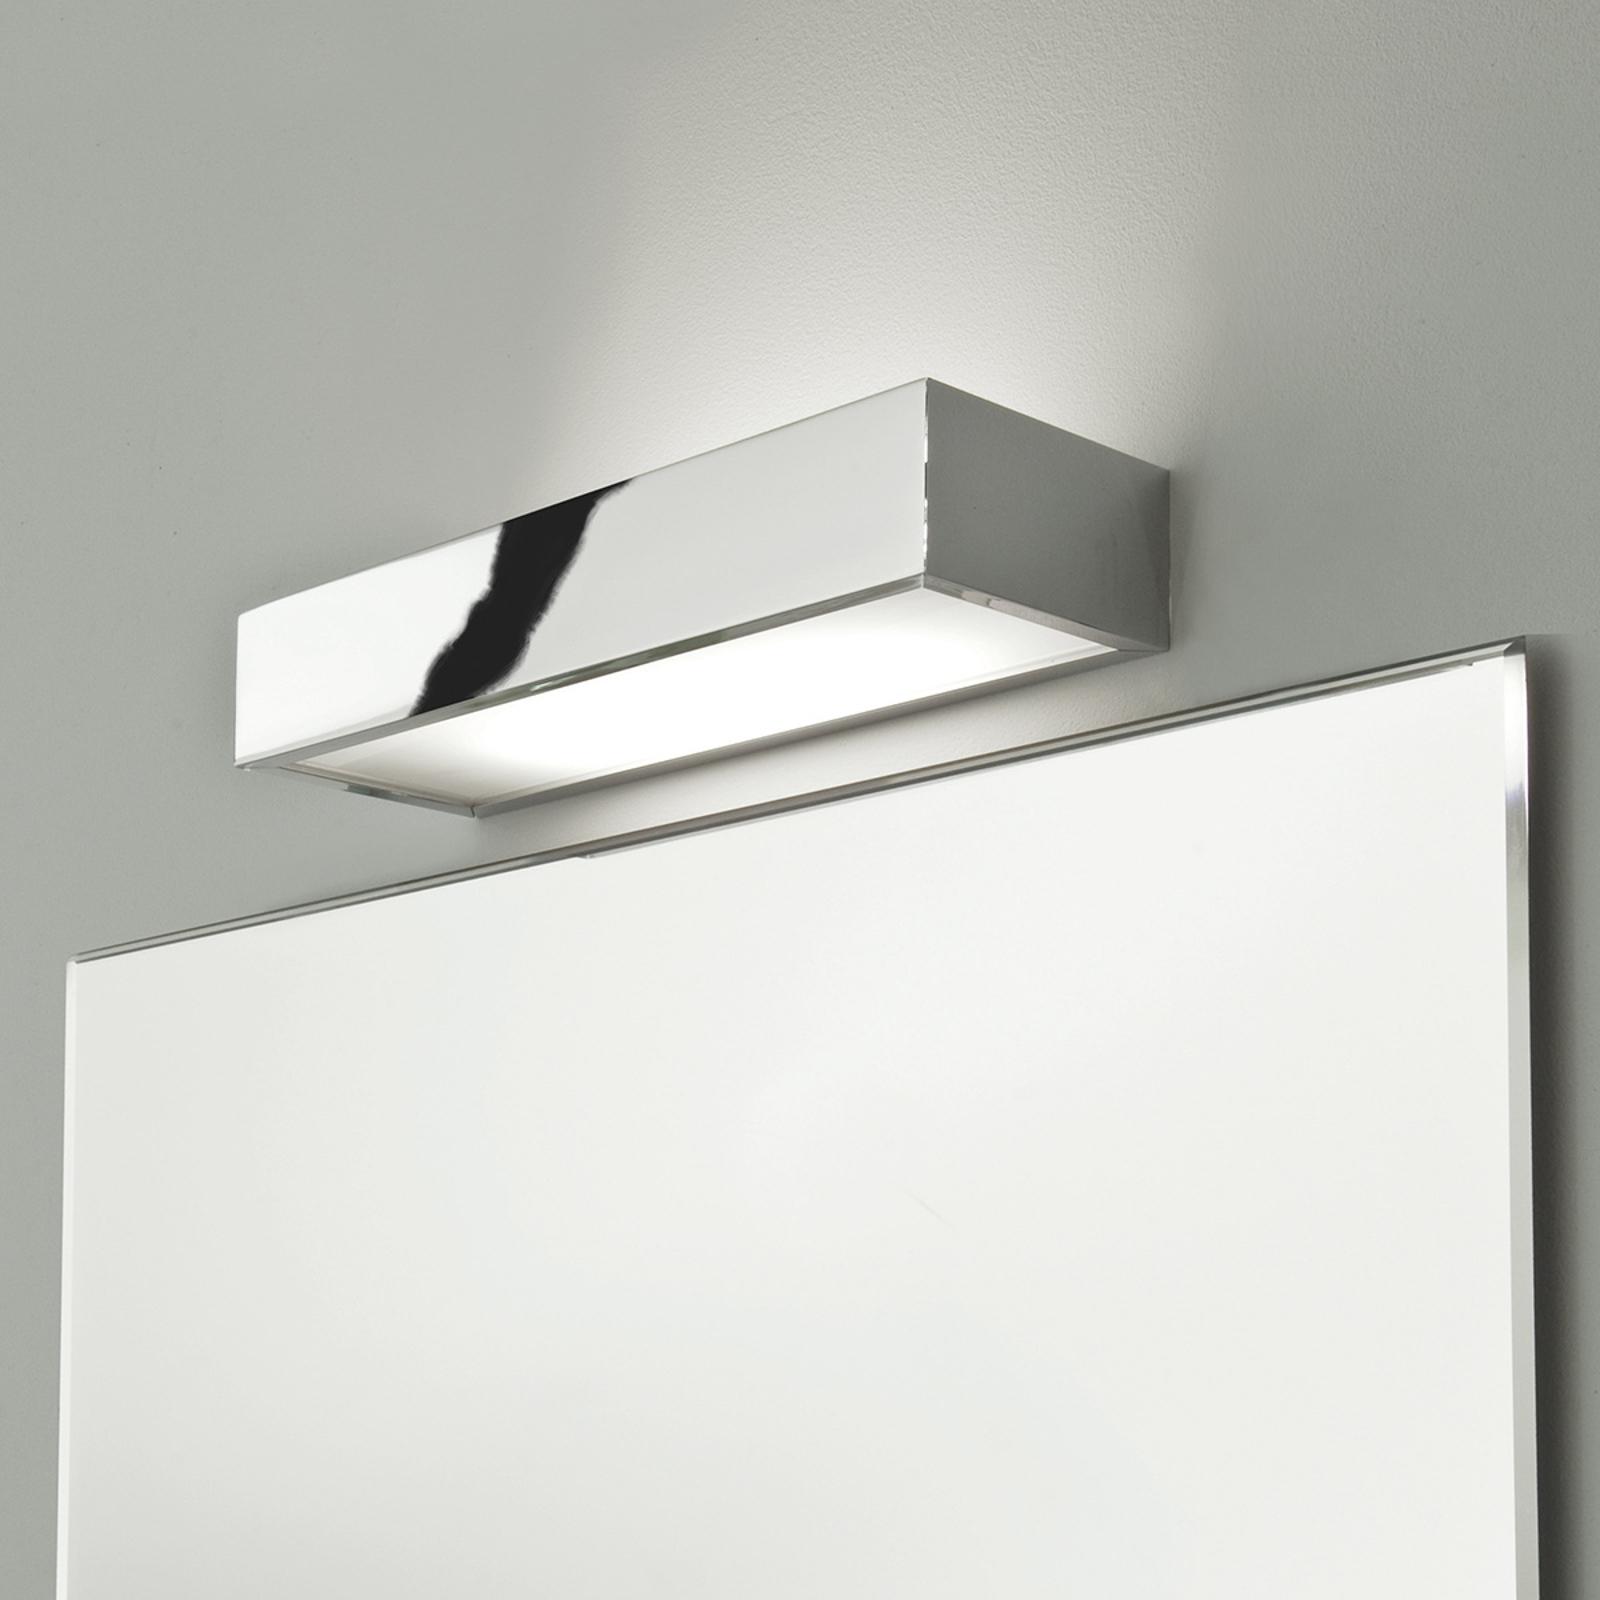 TALLIN væglampe for indirekte lys